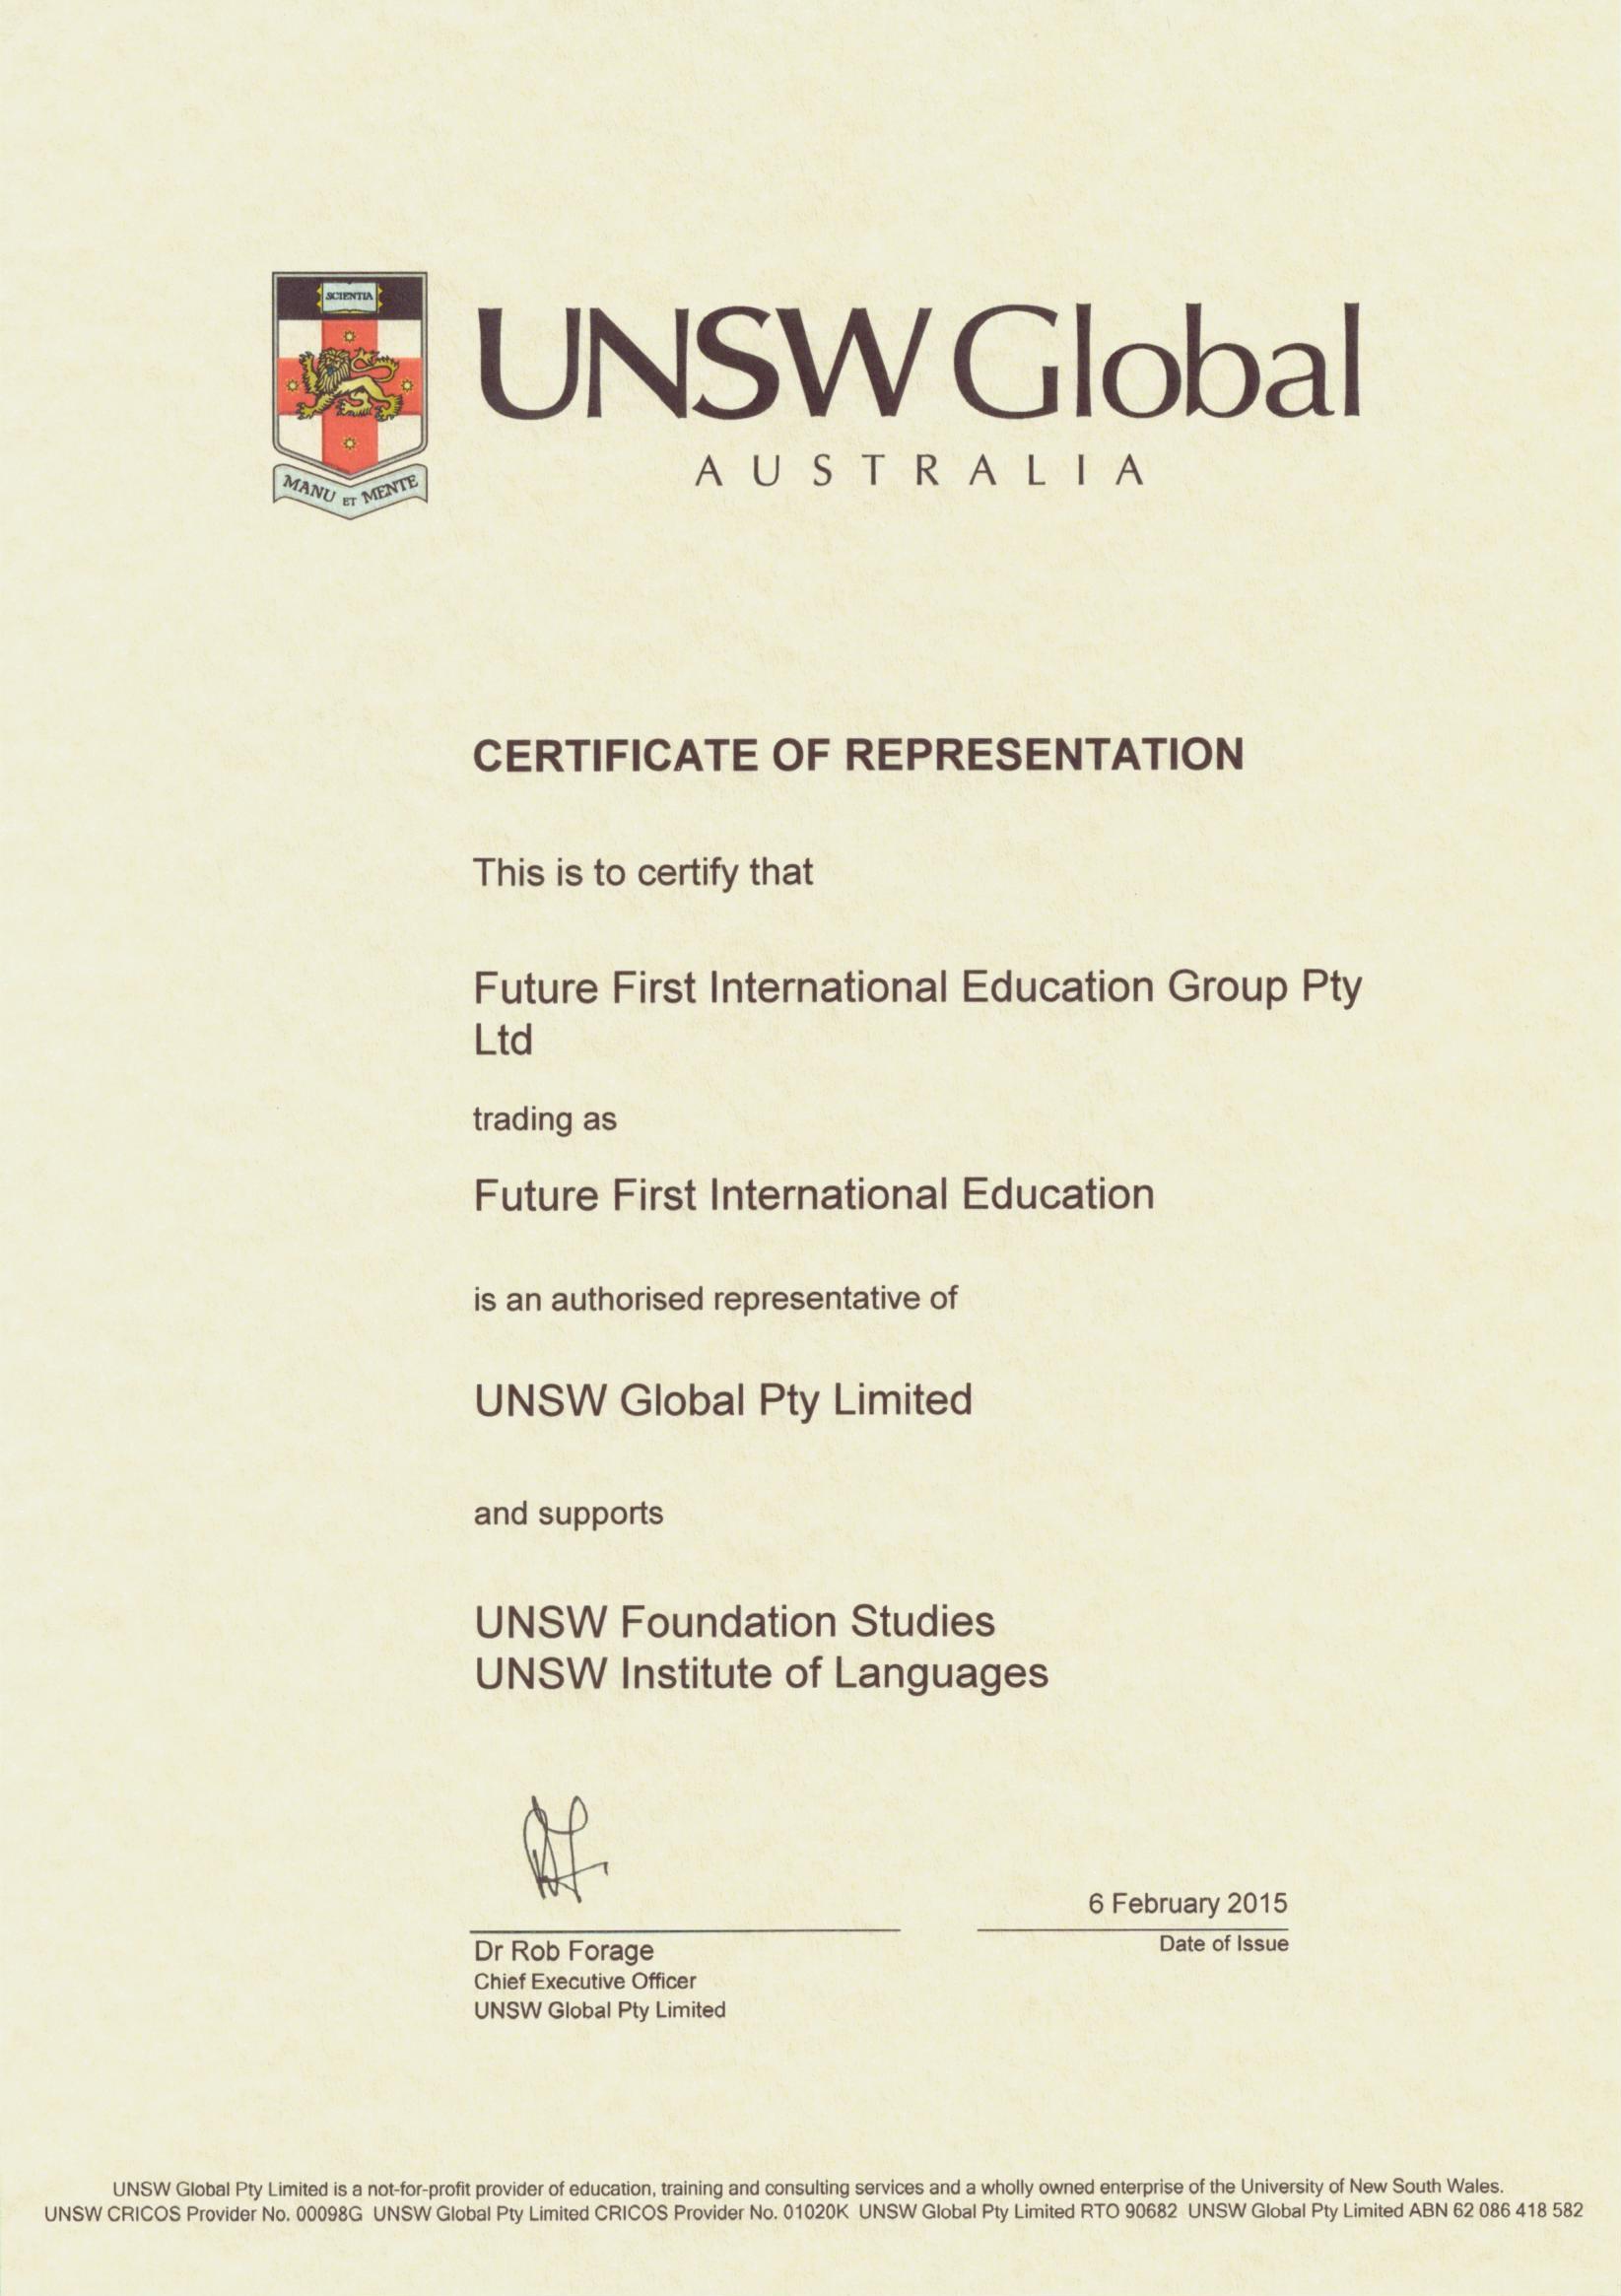 UNSW Global